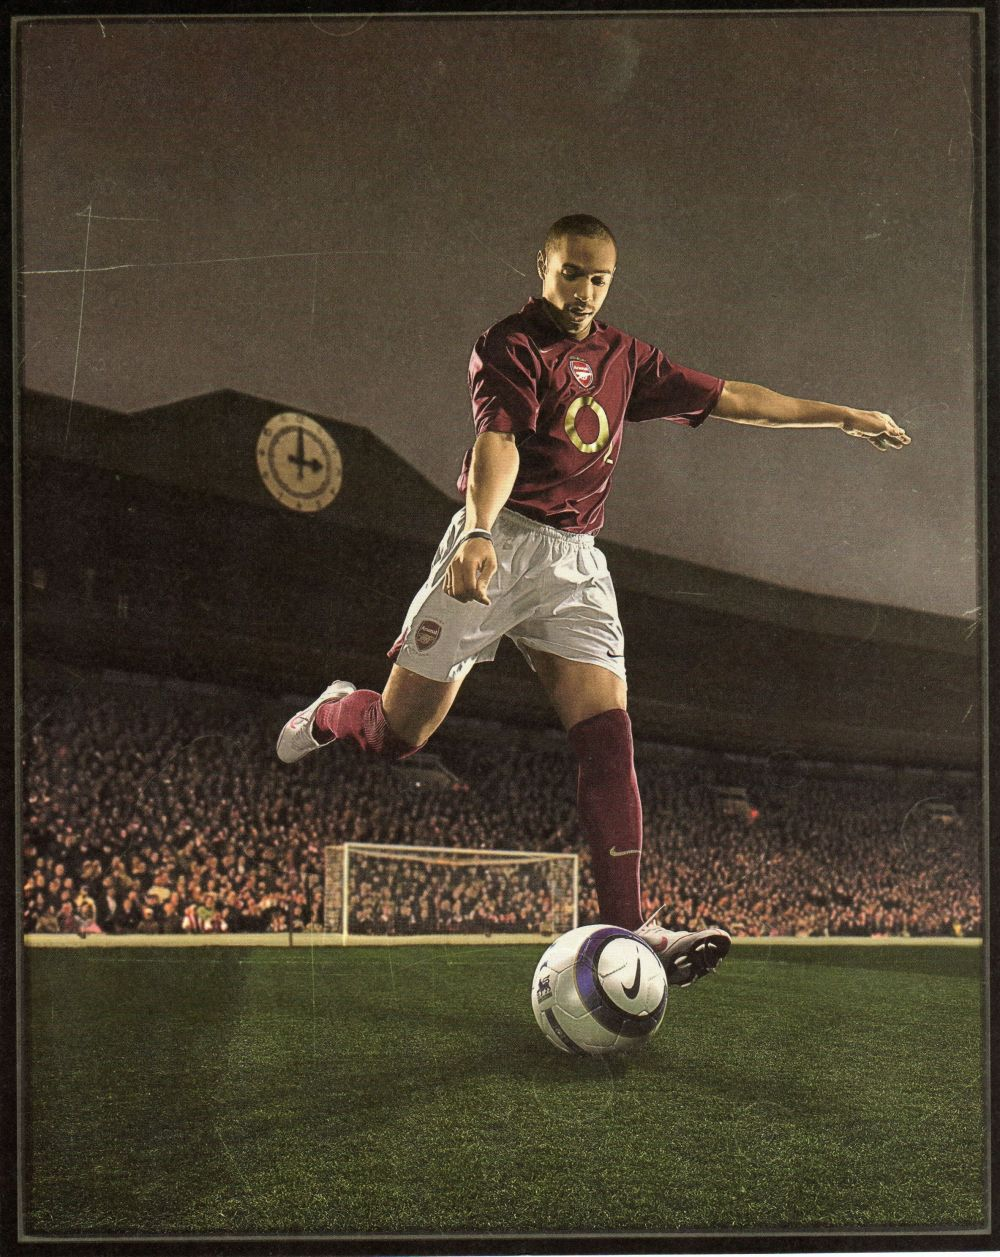 histoire-maillot-arsenal-O2-2006-bordeaux-highbury-1